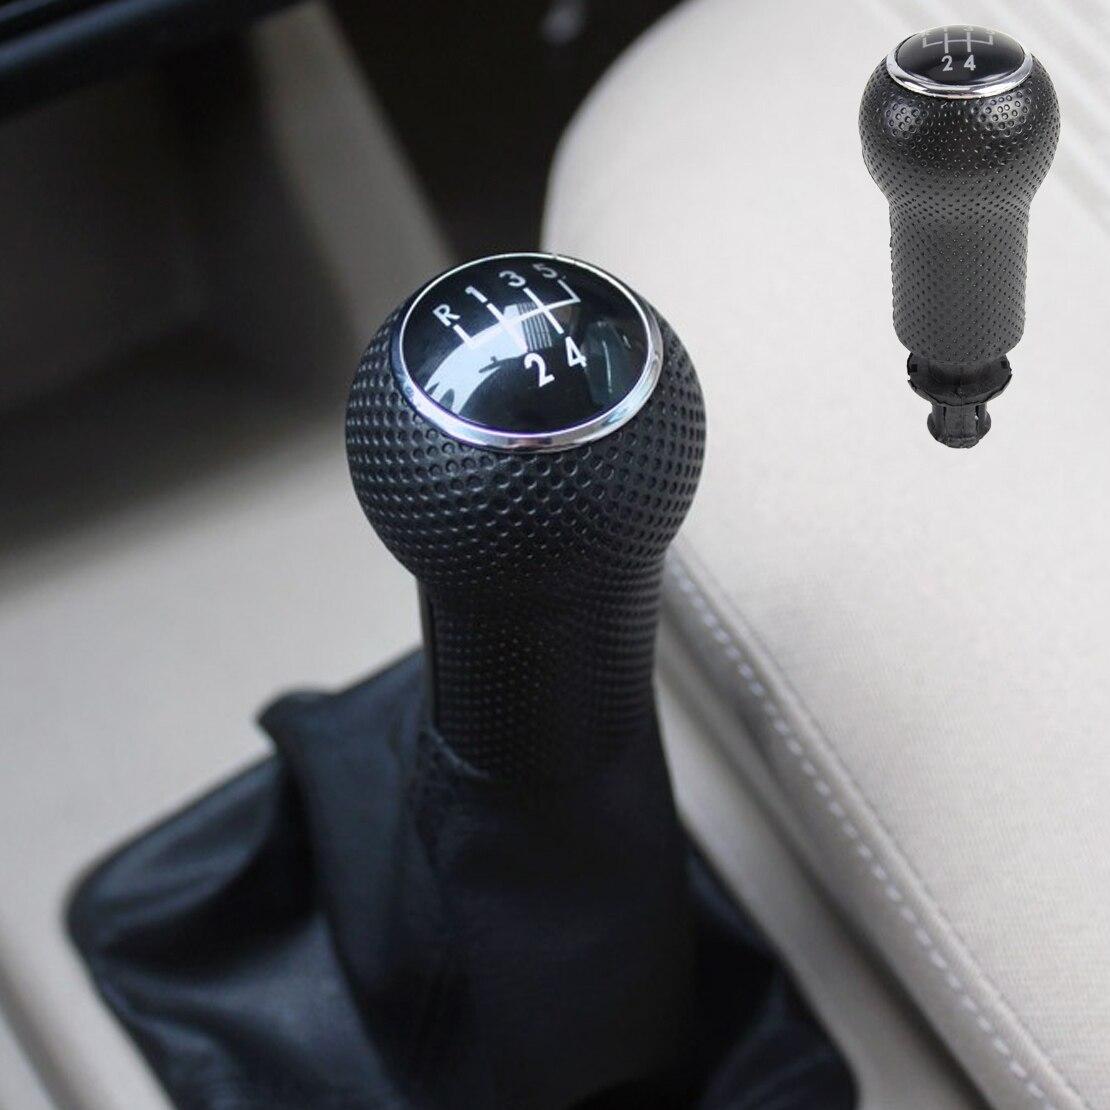 Beler 5 Speed Black Pookknop voor VW Jetta Bora Golf Mk4 R32 GTI 1999 2000 2001 2002 2003 2004